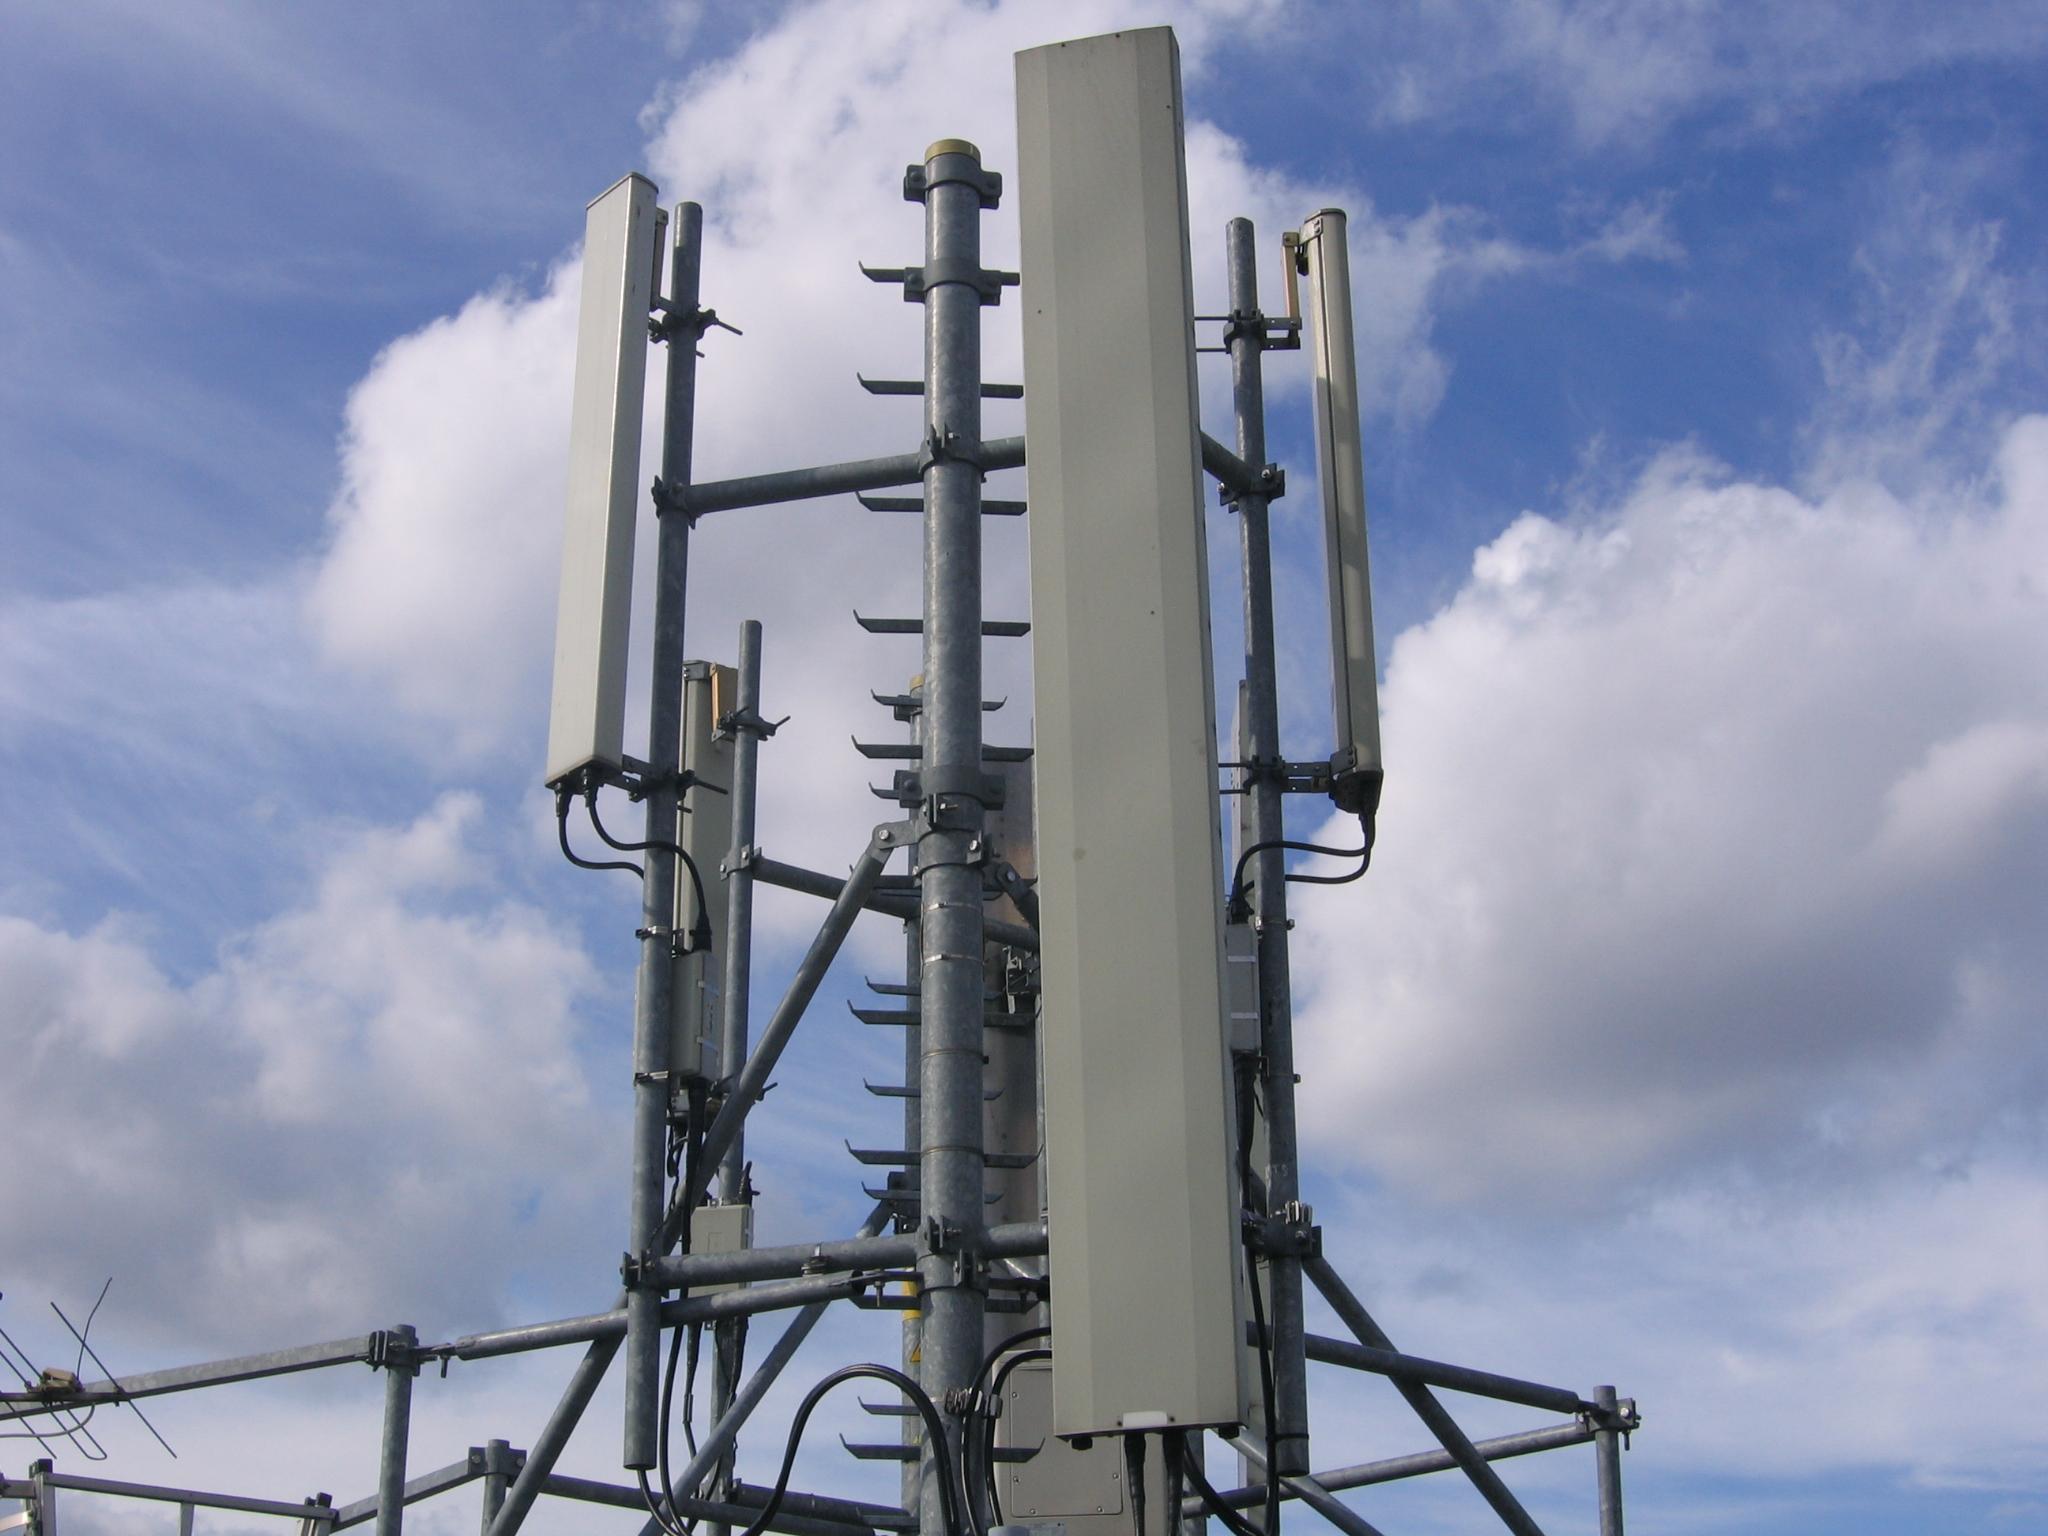 Cellular Base Station Generator Monitoring